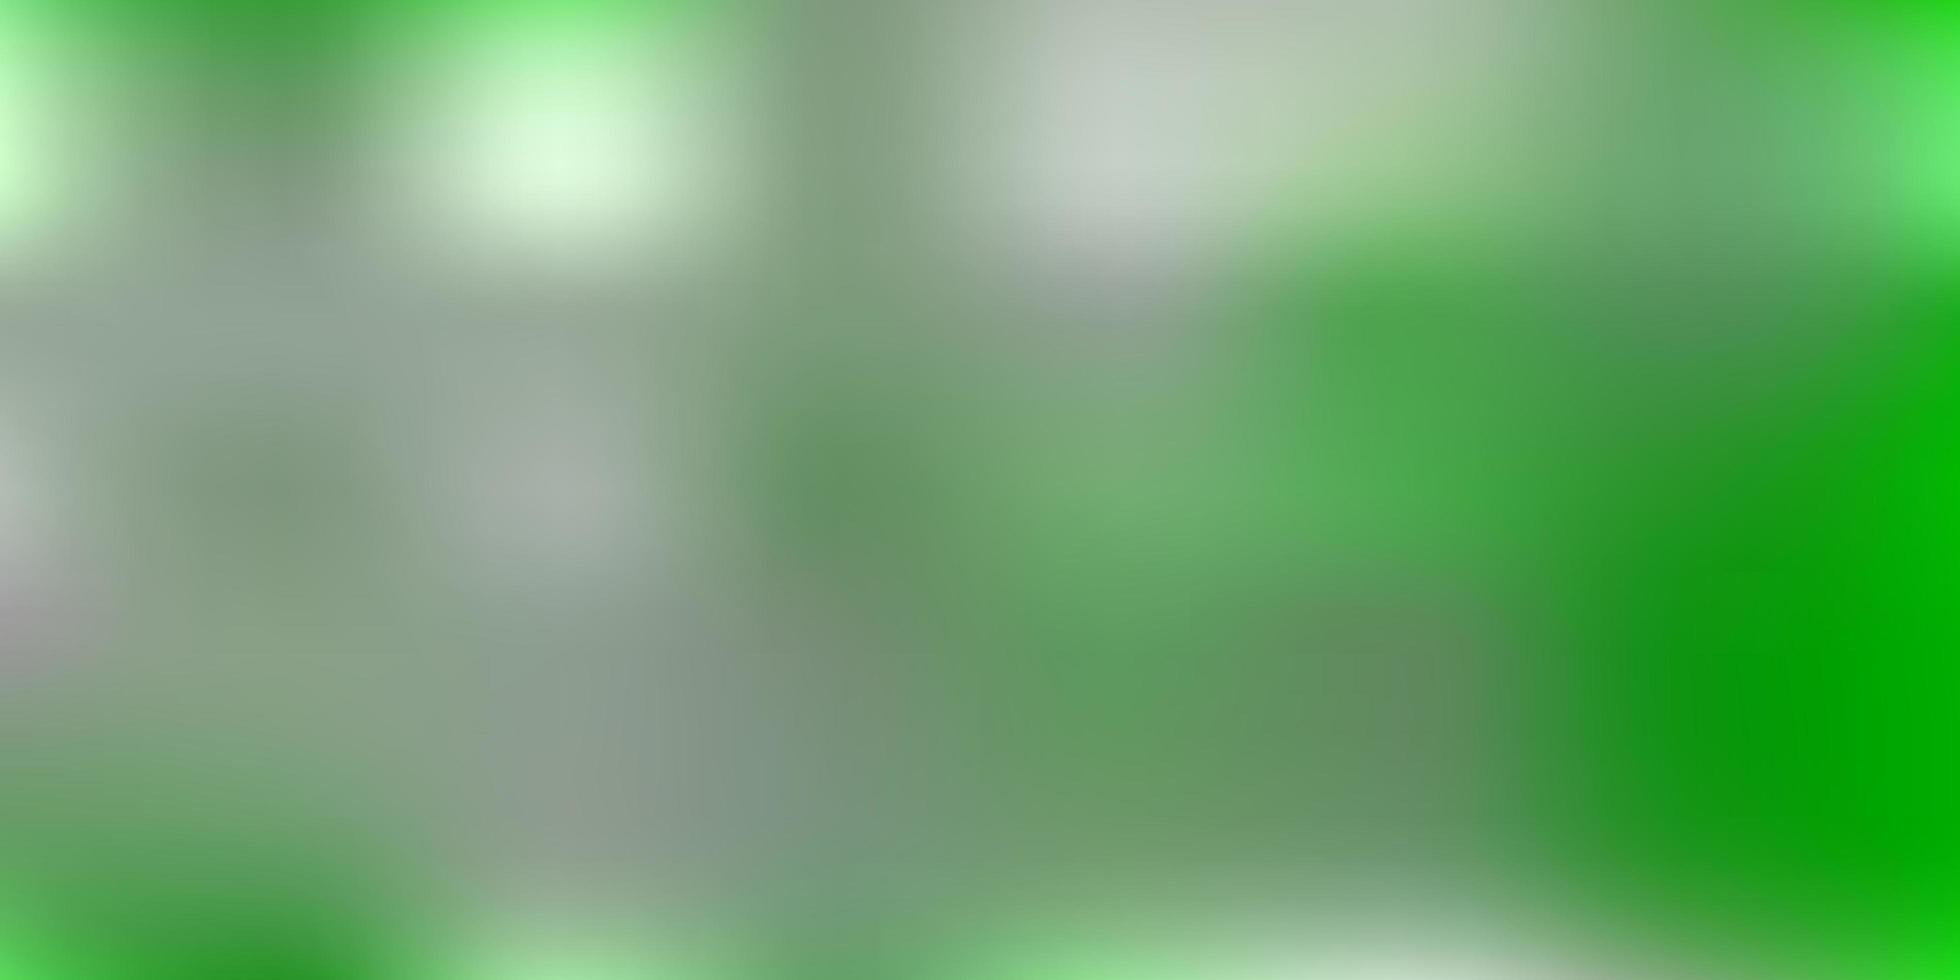 trama sfocatura sfumatura vettoriale verde chiaro.